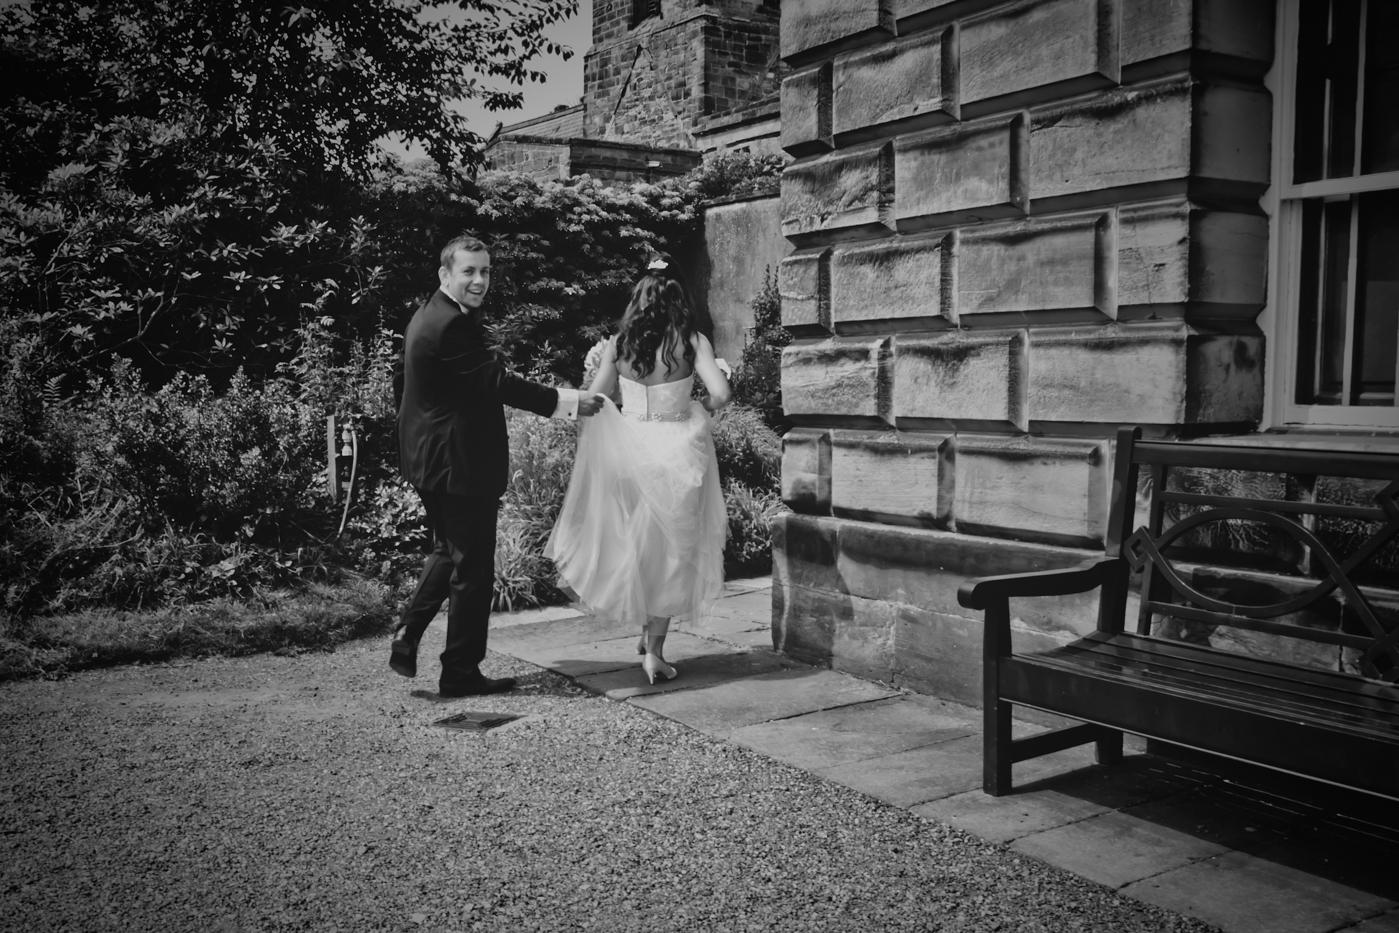 104 - Abi and Chris at Kedleston Hall - Wedding Photography by Mark Pugh www.markpugh.com - 5475.JPG